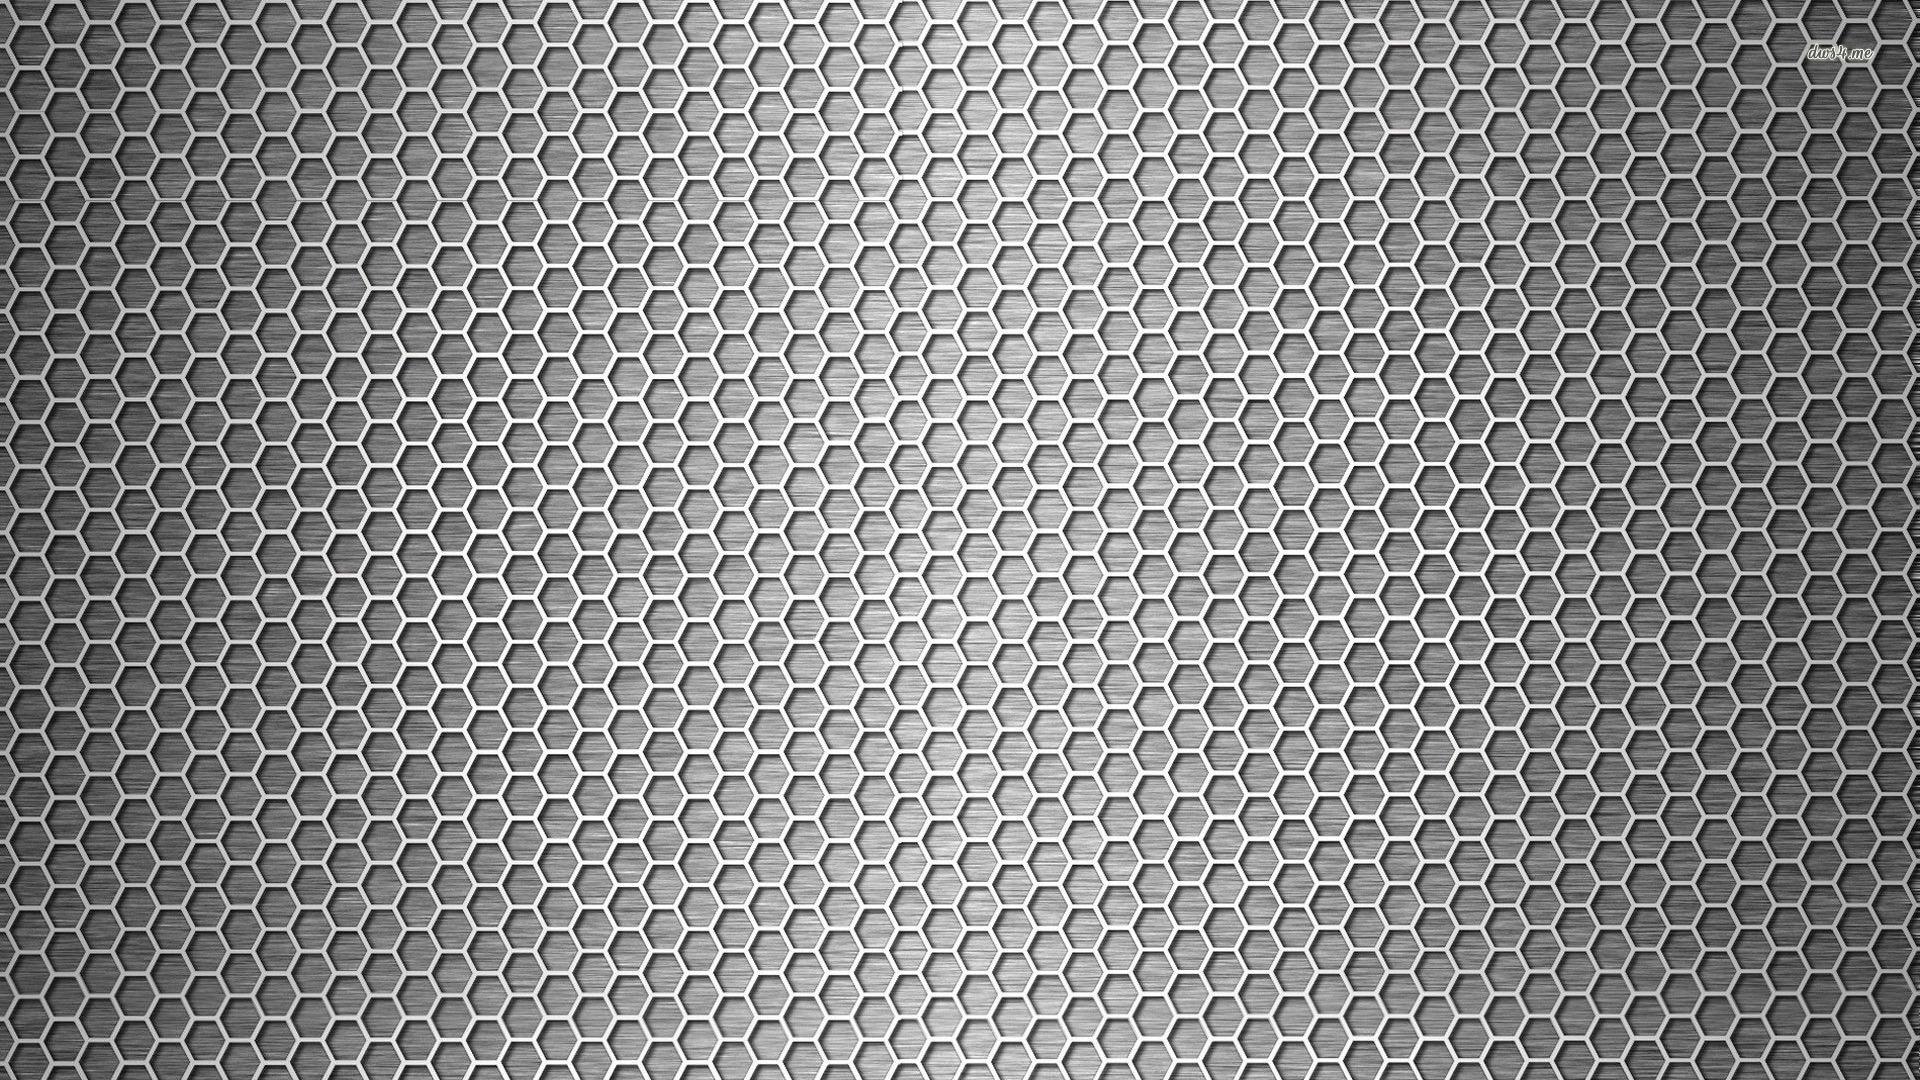 Carbon-Fiber-Gryffin-By-Betahouse-HD-desktop-1920%C3%971080-Carbon-Fiber-Wallpa-wallpaper-wpc5803272